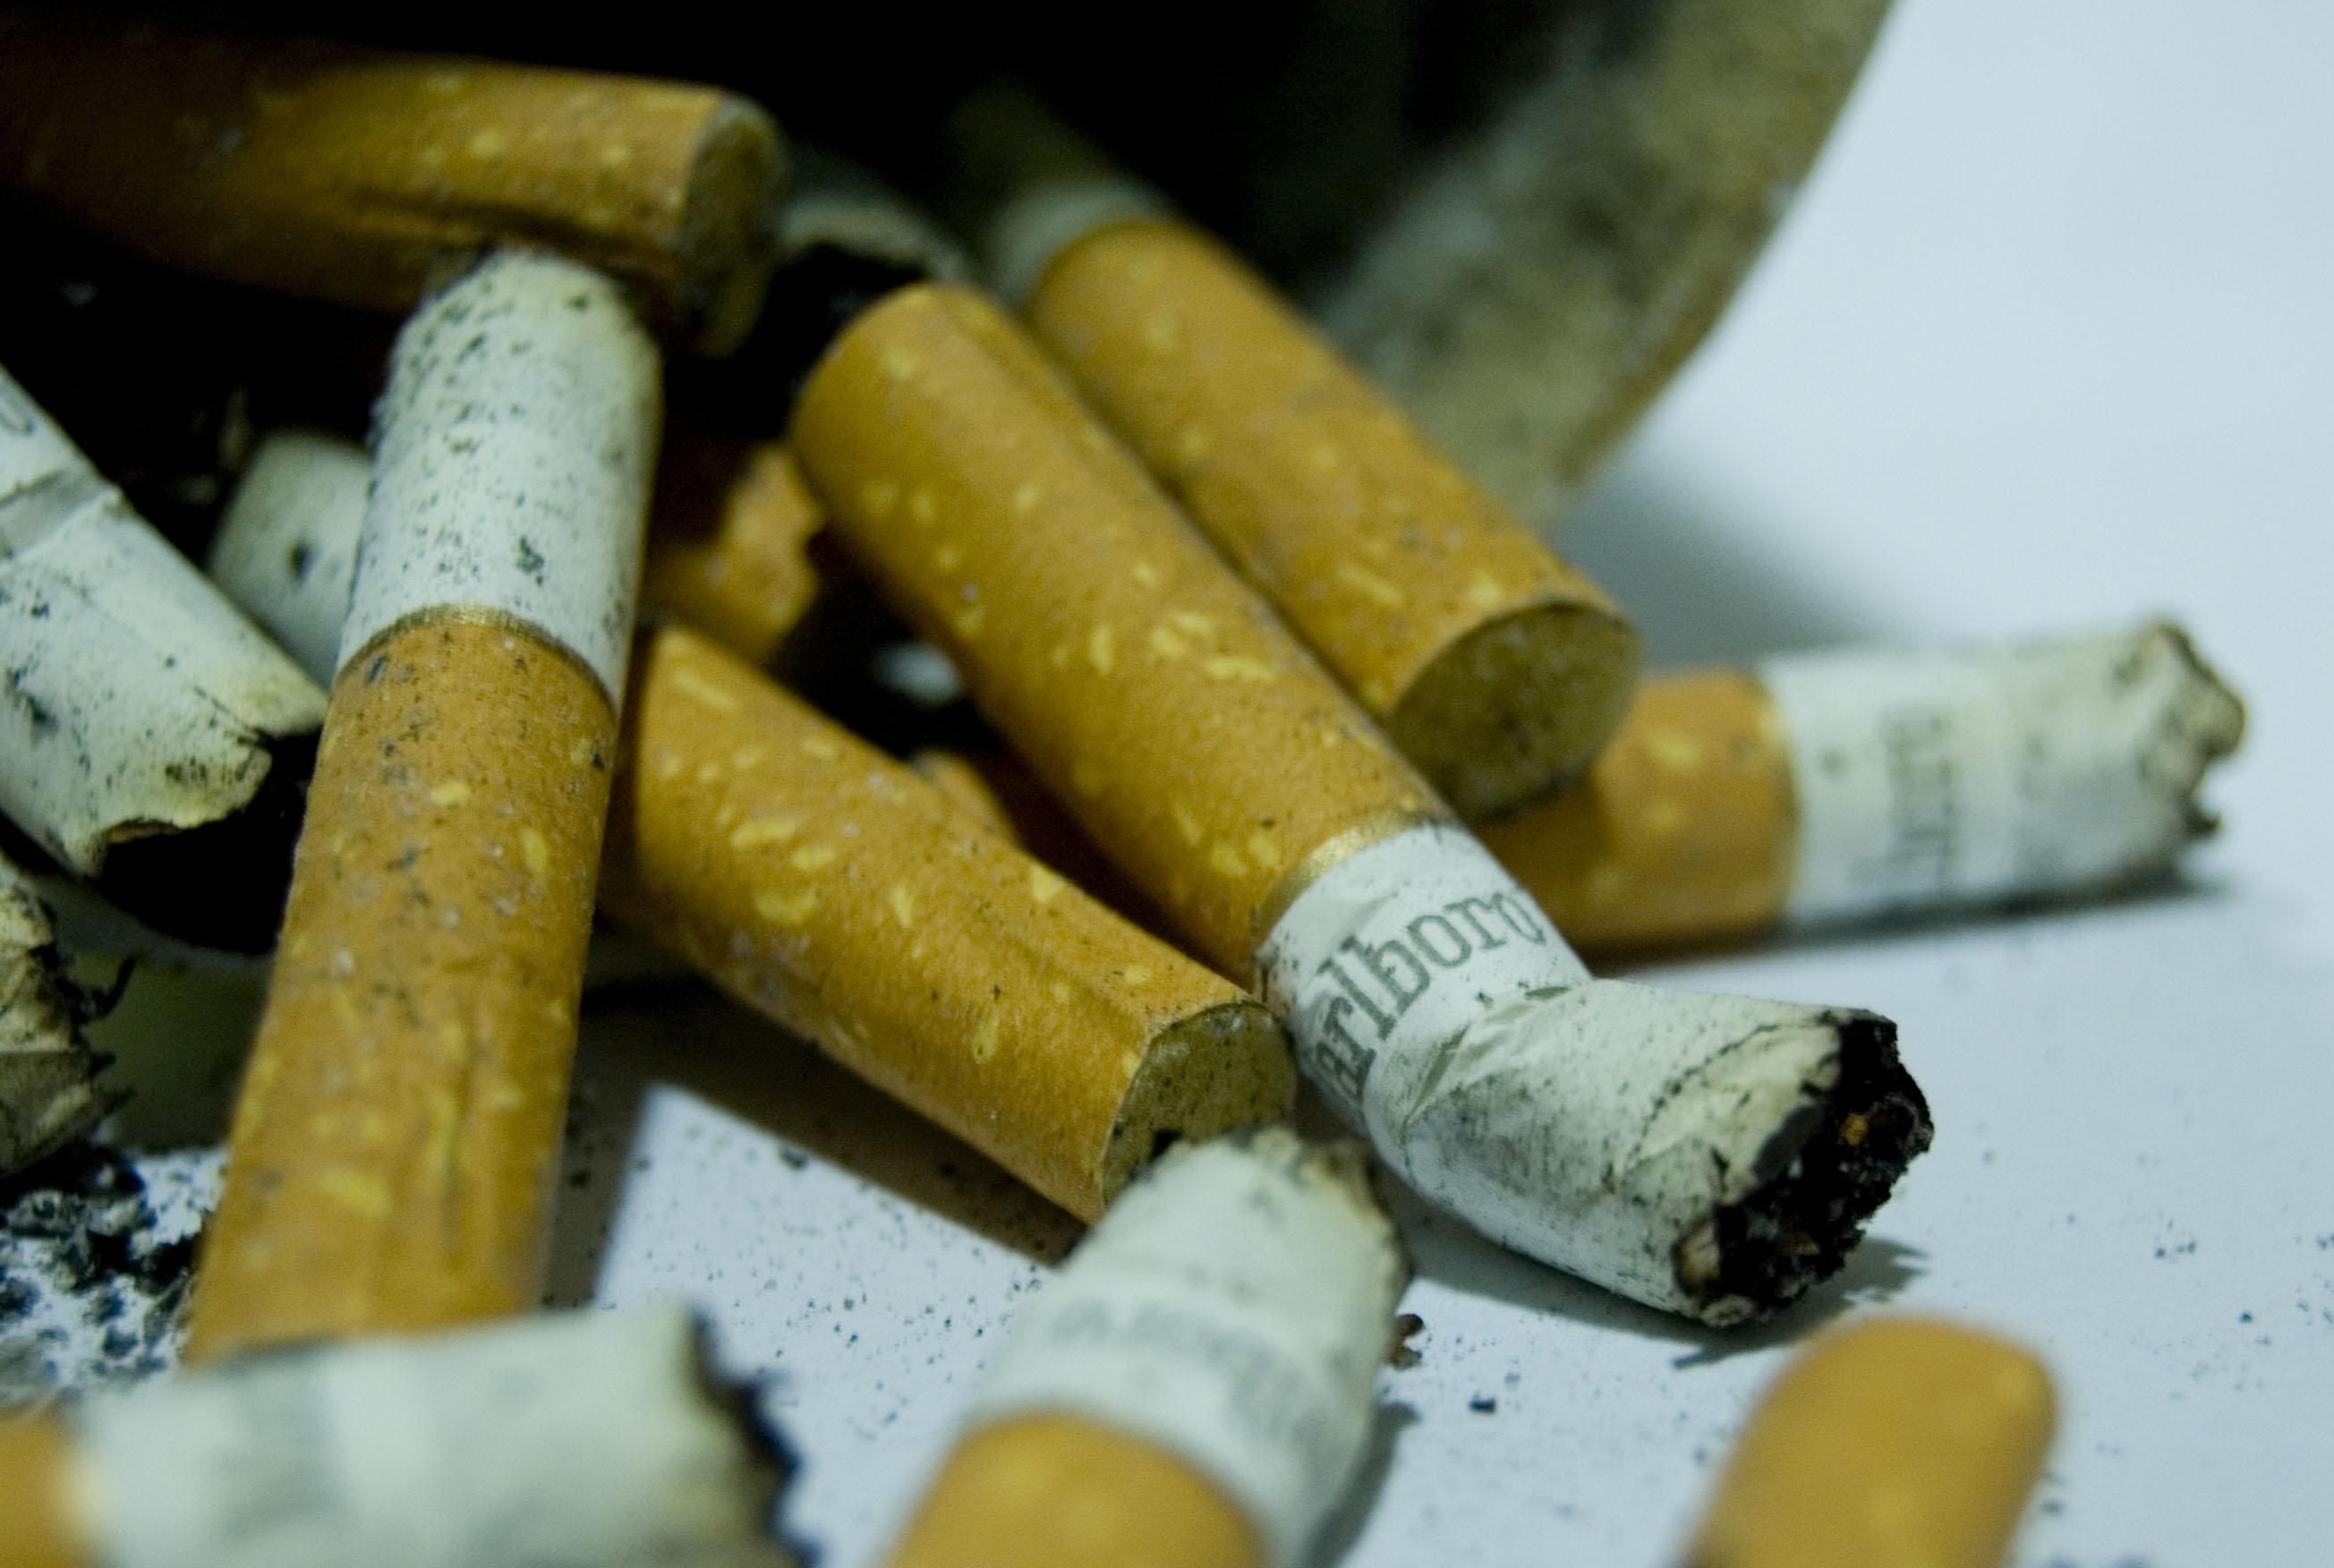 http://upload.wikimedia.org/wikipedia/commons/6/6c/Marlboro_Cigarettes.jpg